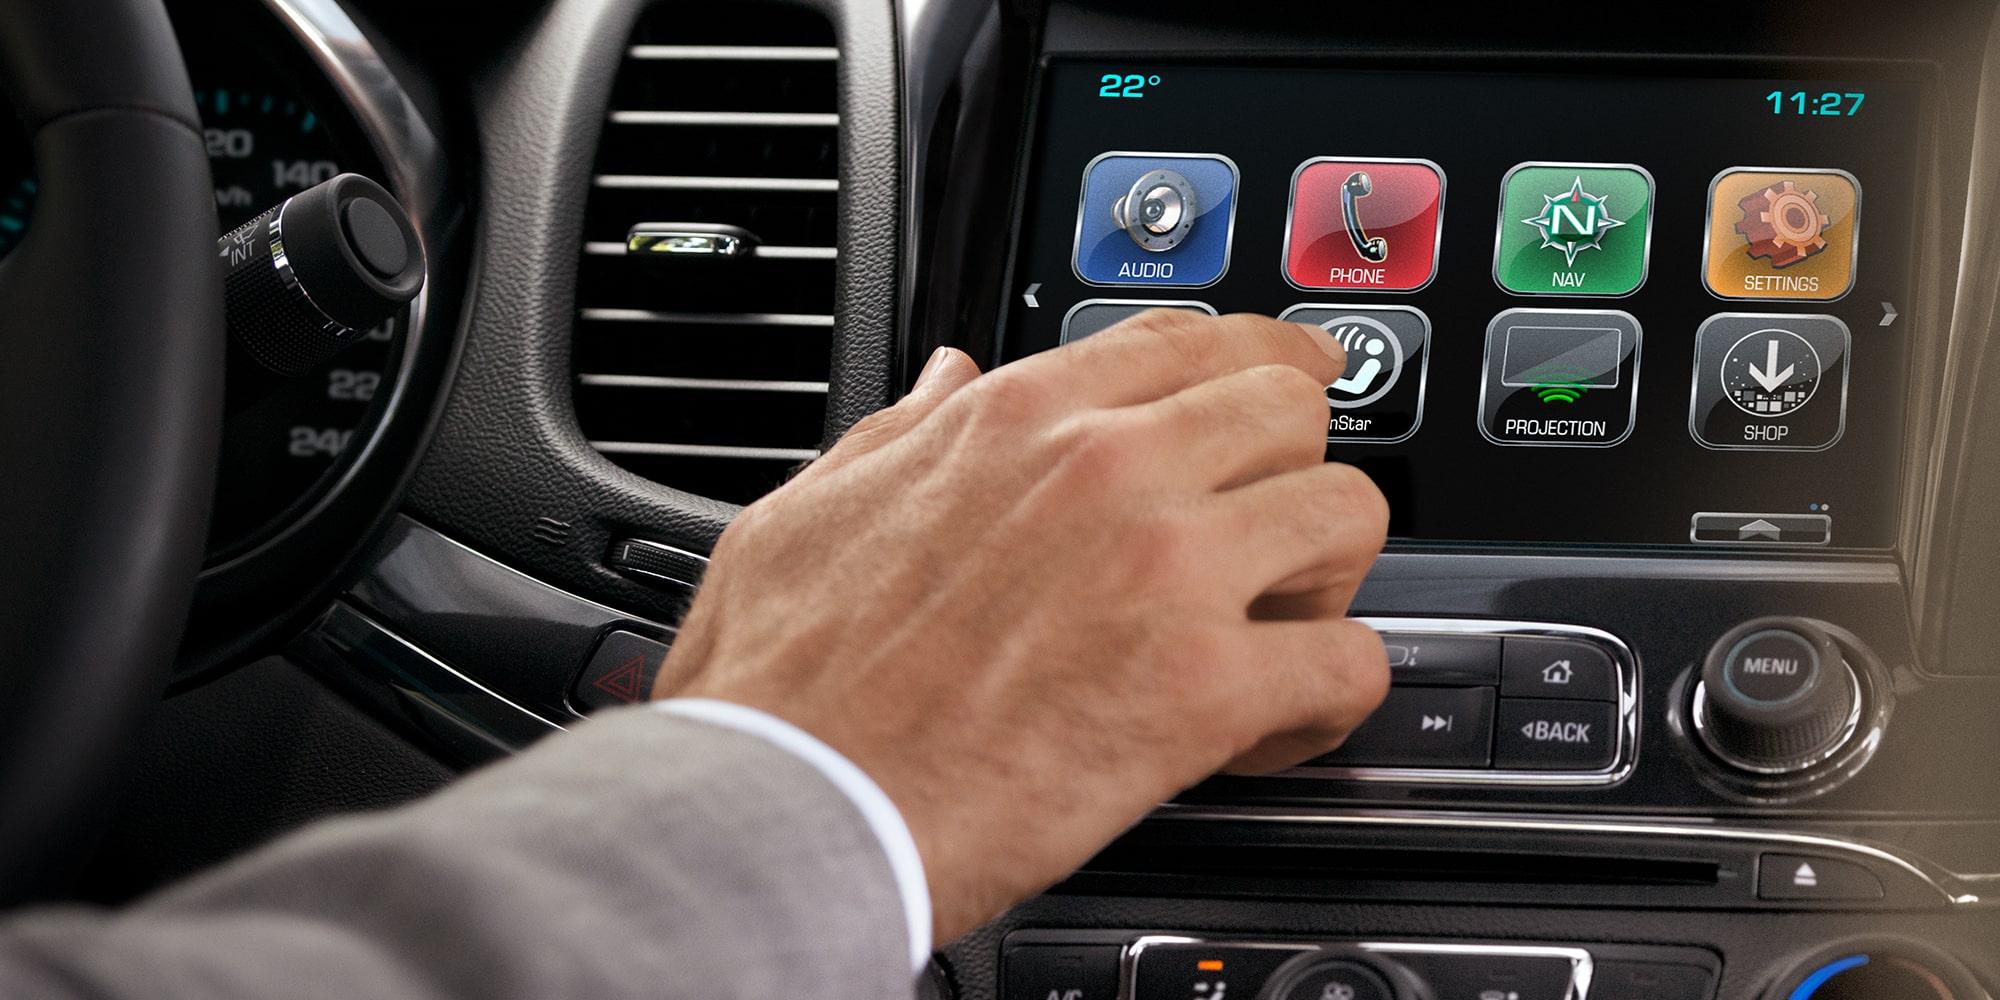 chevrolet mylink take control of your vehicle s technology chevrolet rh chevrolet com 2016 chevy navigation system manual chevy silverado navigation system manual